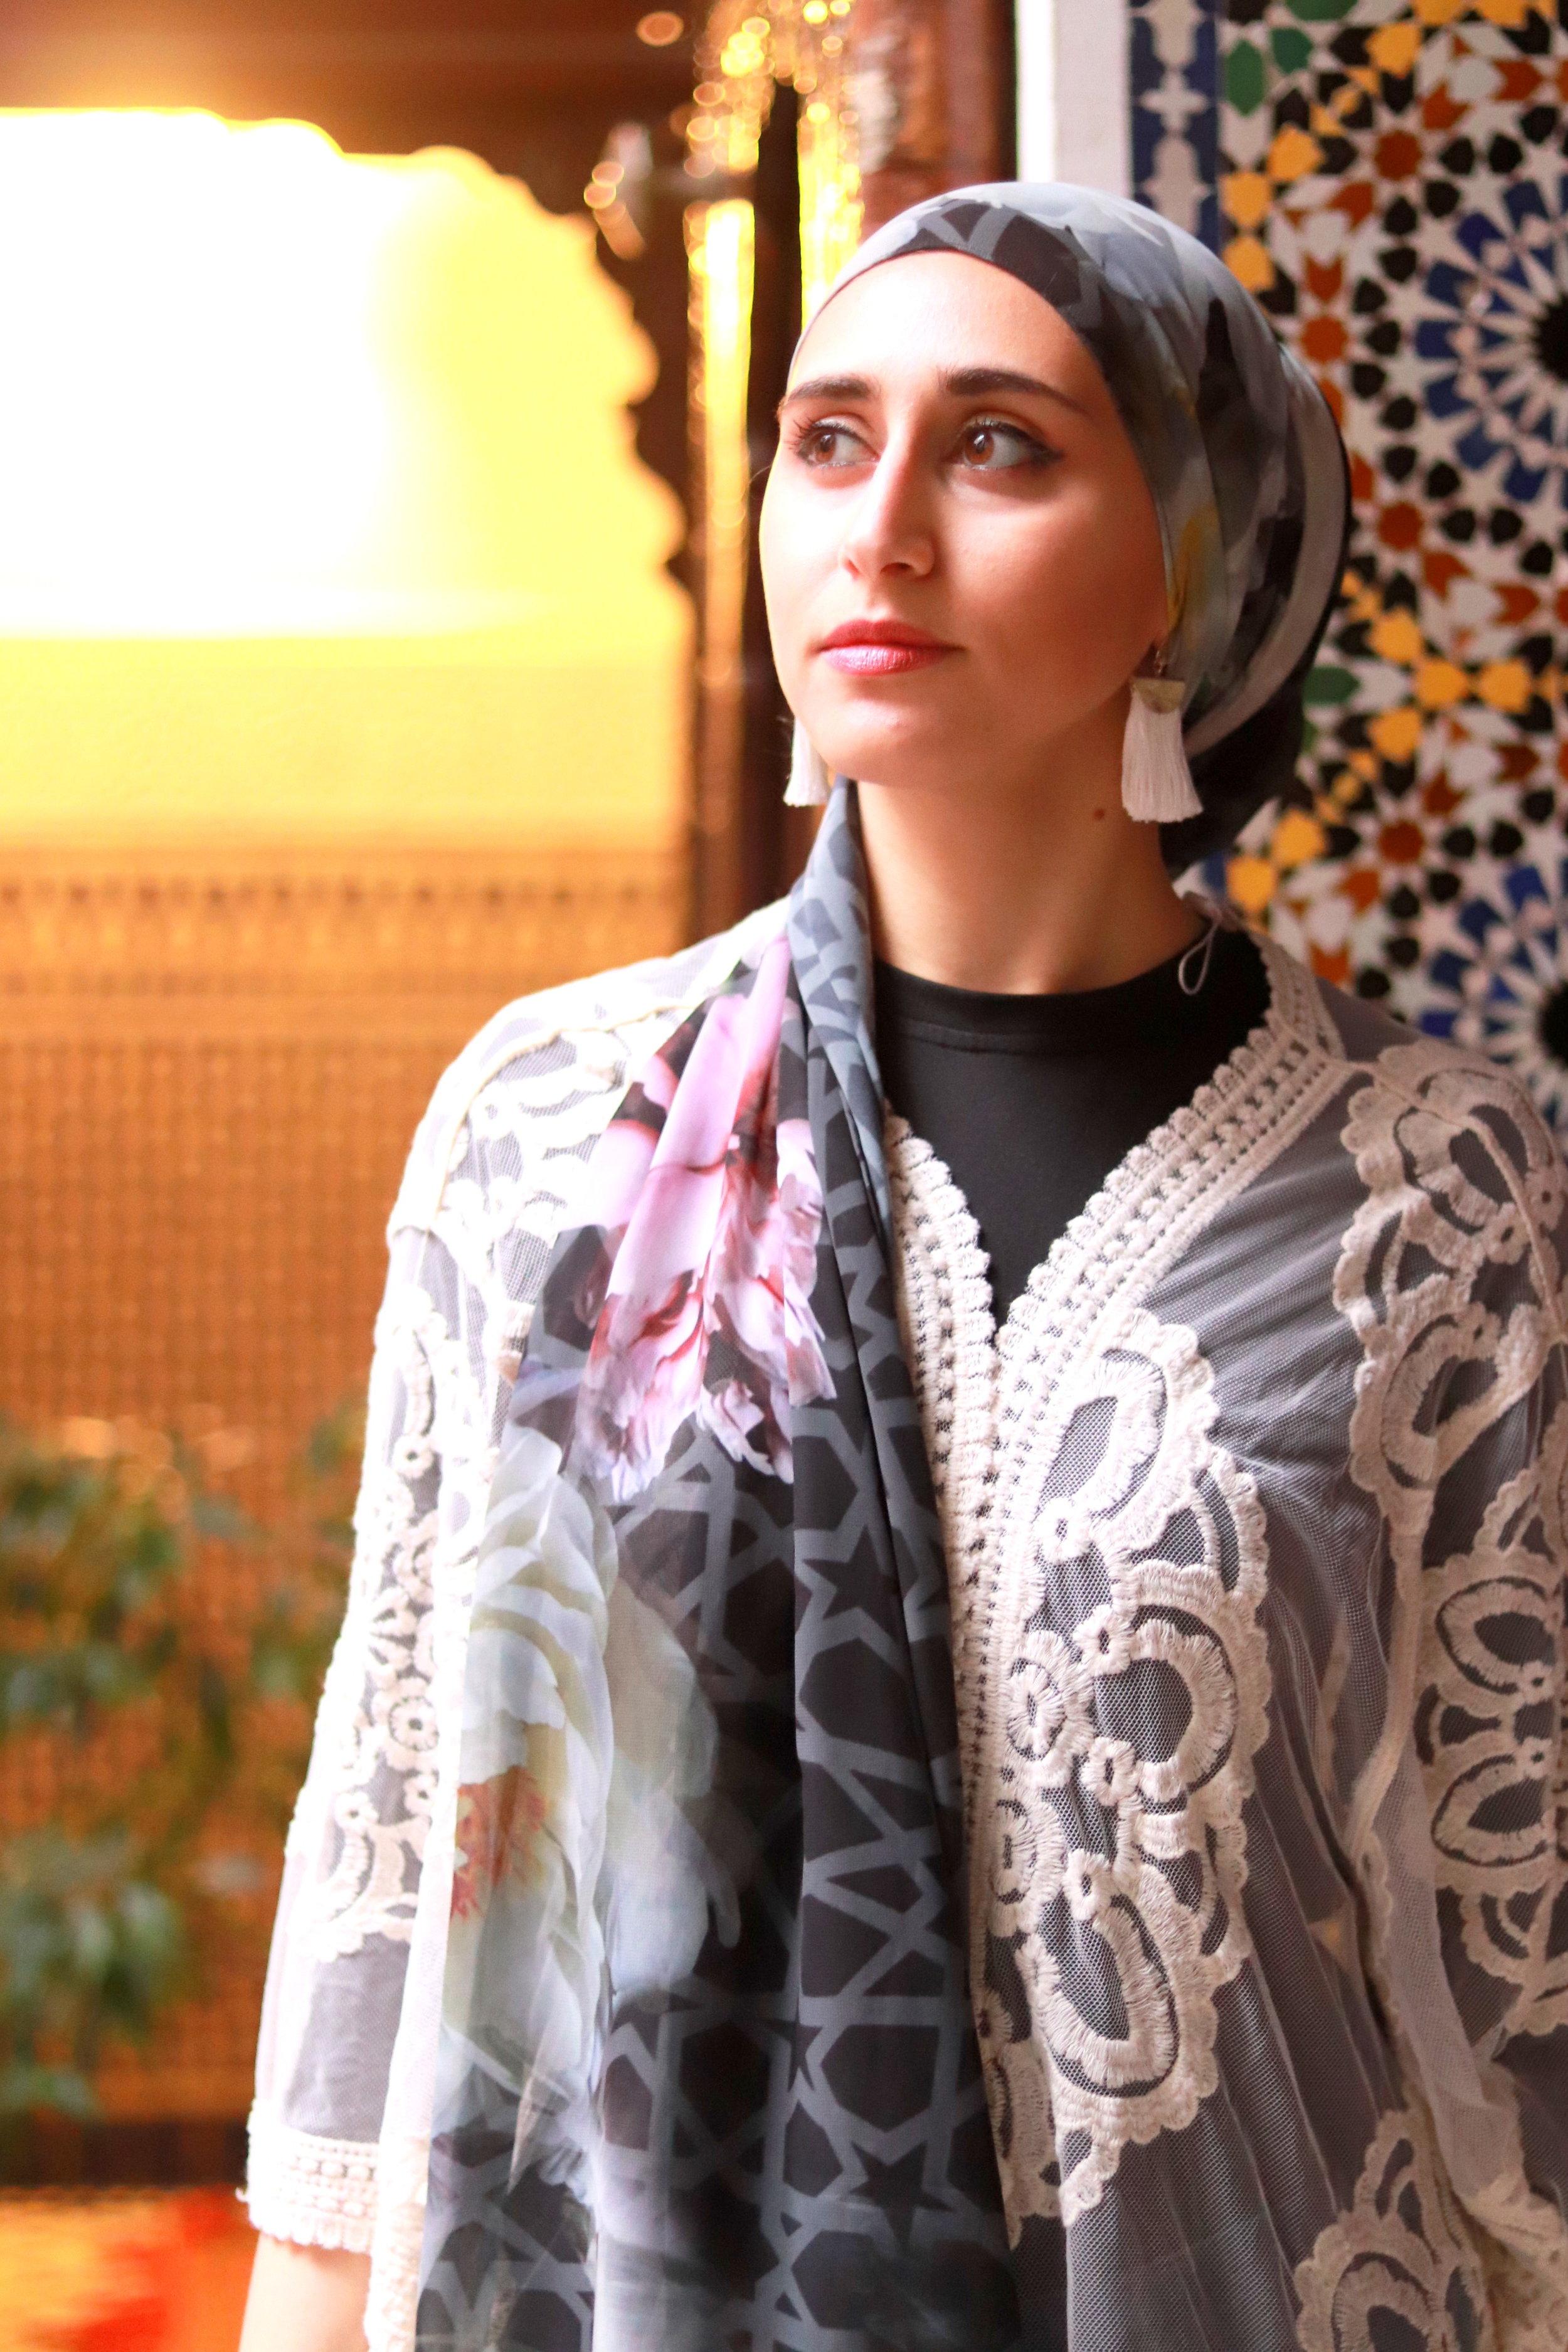 fez-morocco what to wear in morocco , morocco outfits karama by hoda arabesque scarf, moroccan scarf, arabesque lifestyle, boho chic boho outfit, geometric scarf mosaic scarf moroccan decor morocco decor nyc arabesque tiles